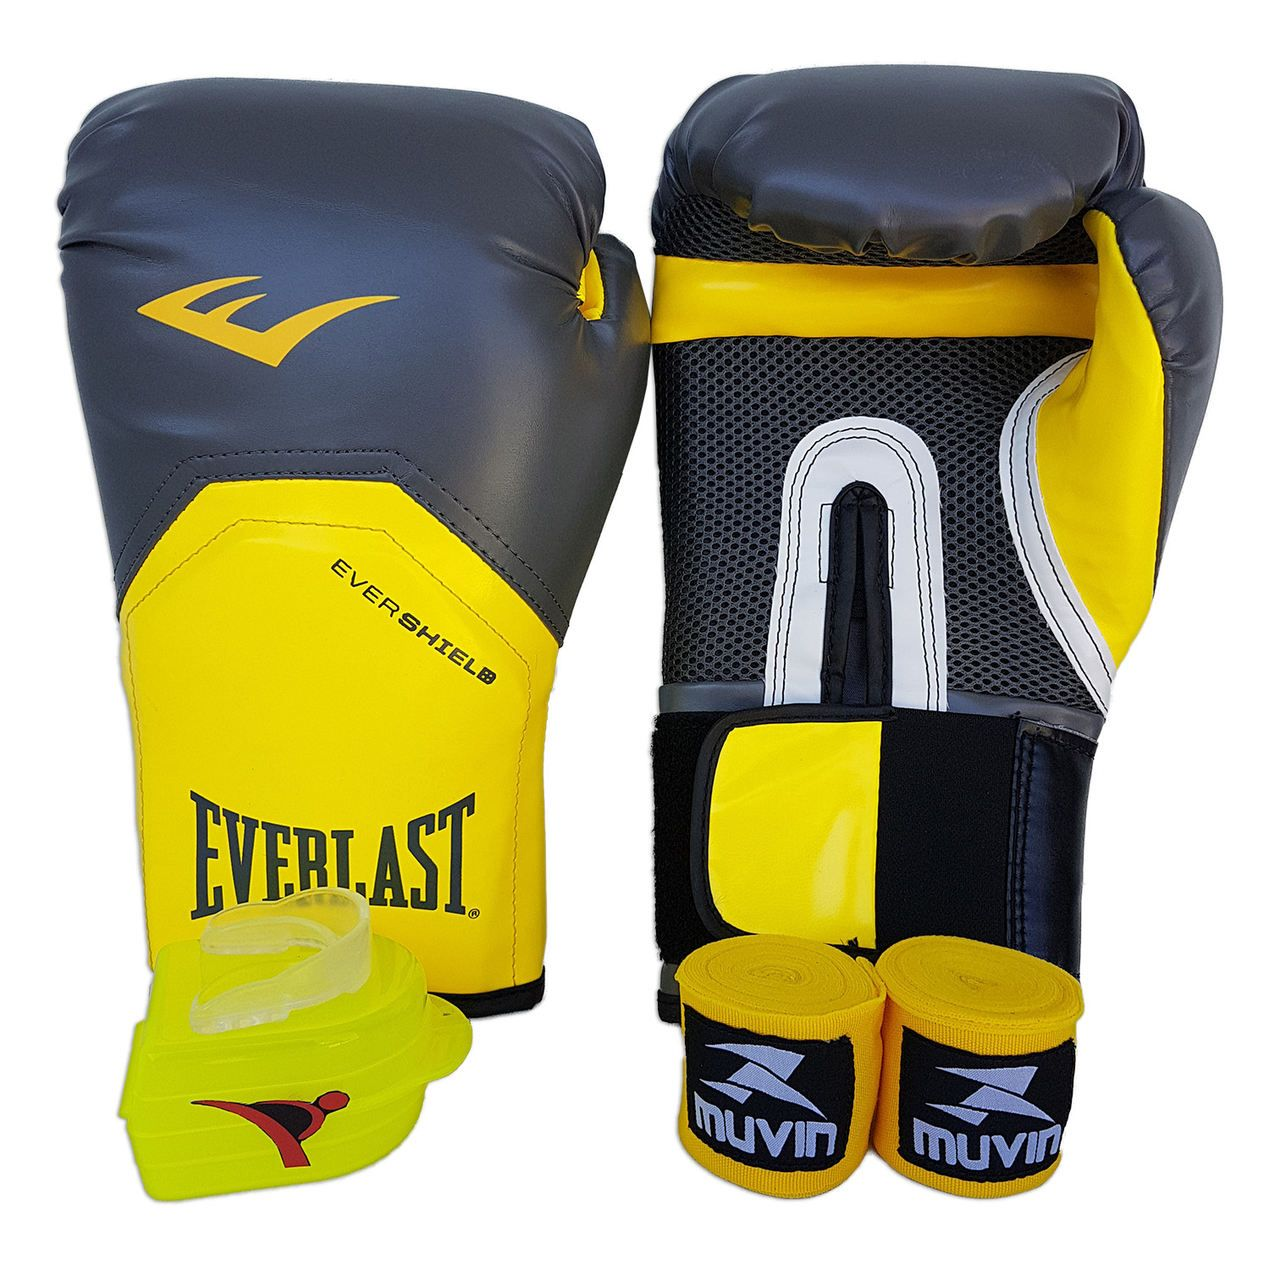 Kit de Boxe / Muay Thai 12oz - Cinza com Amarelo - Pro Style - Everlast  - PRALUTA SHOP